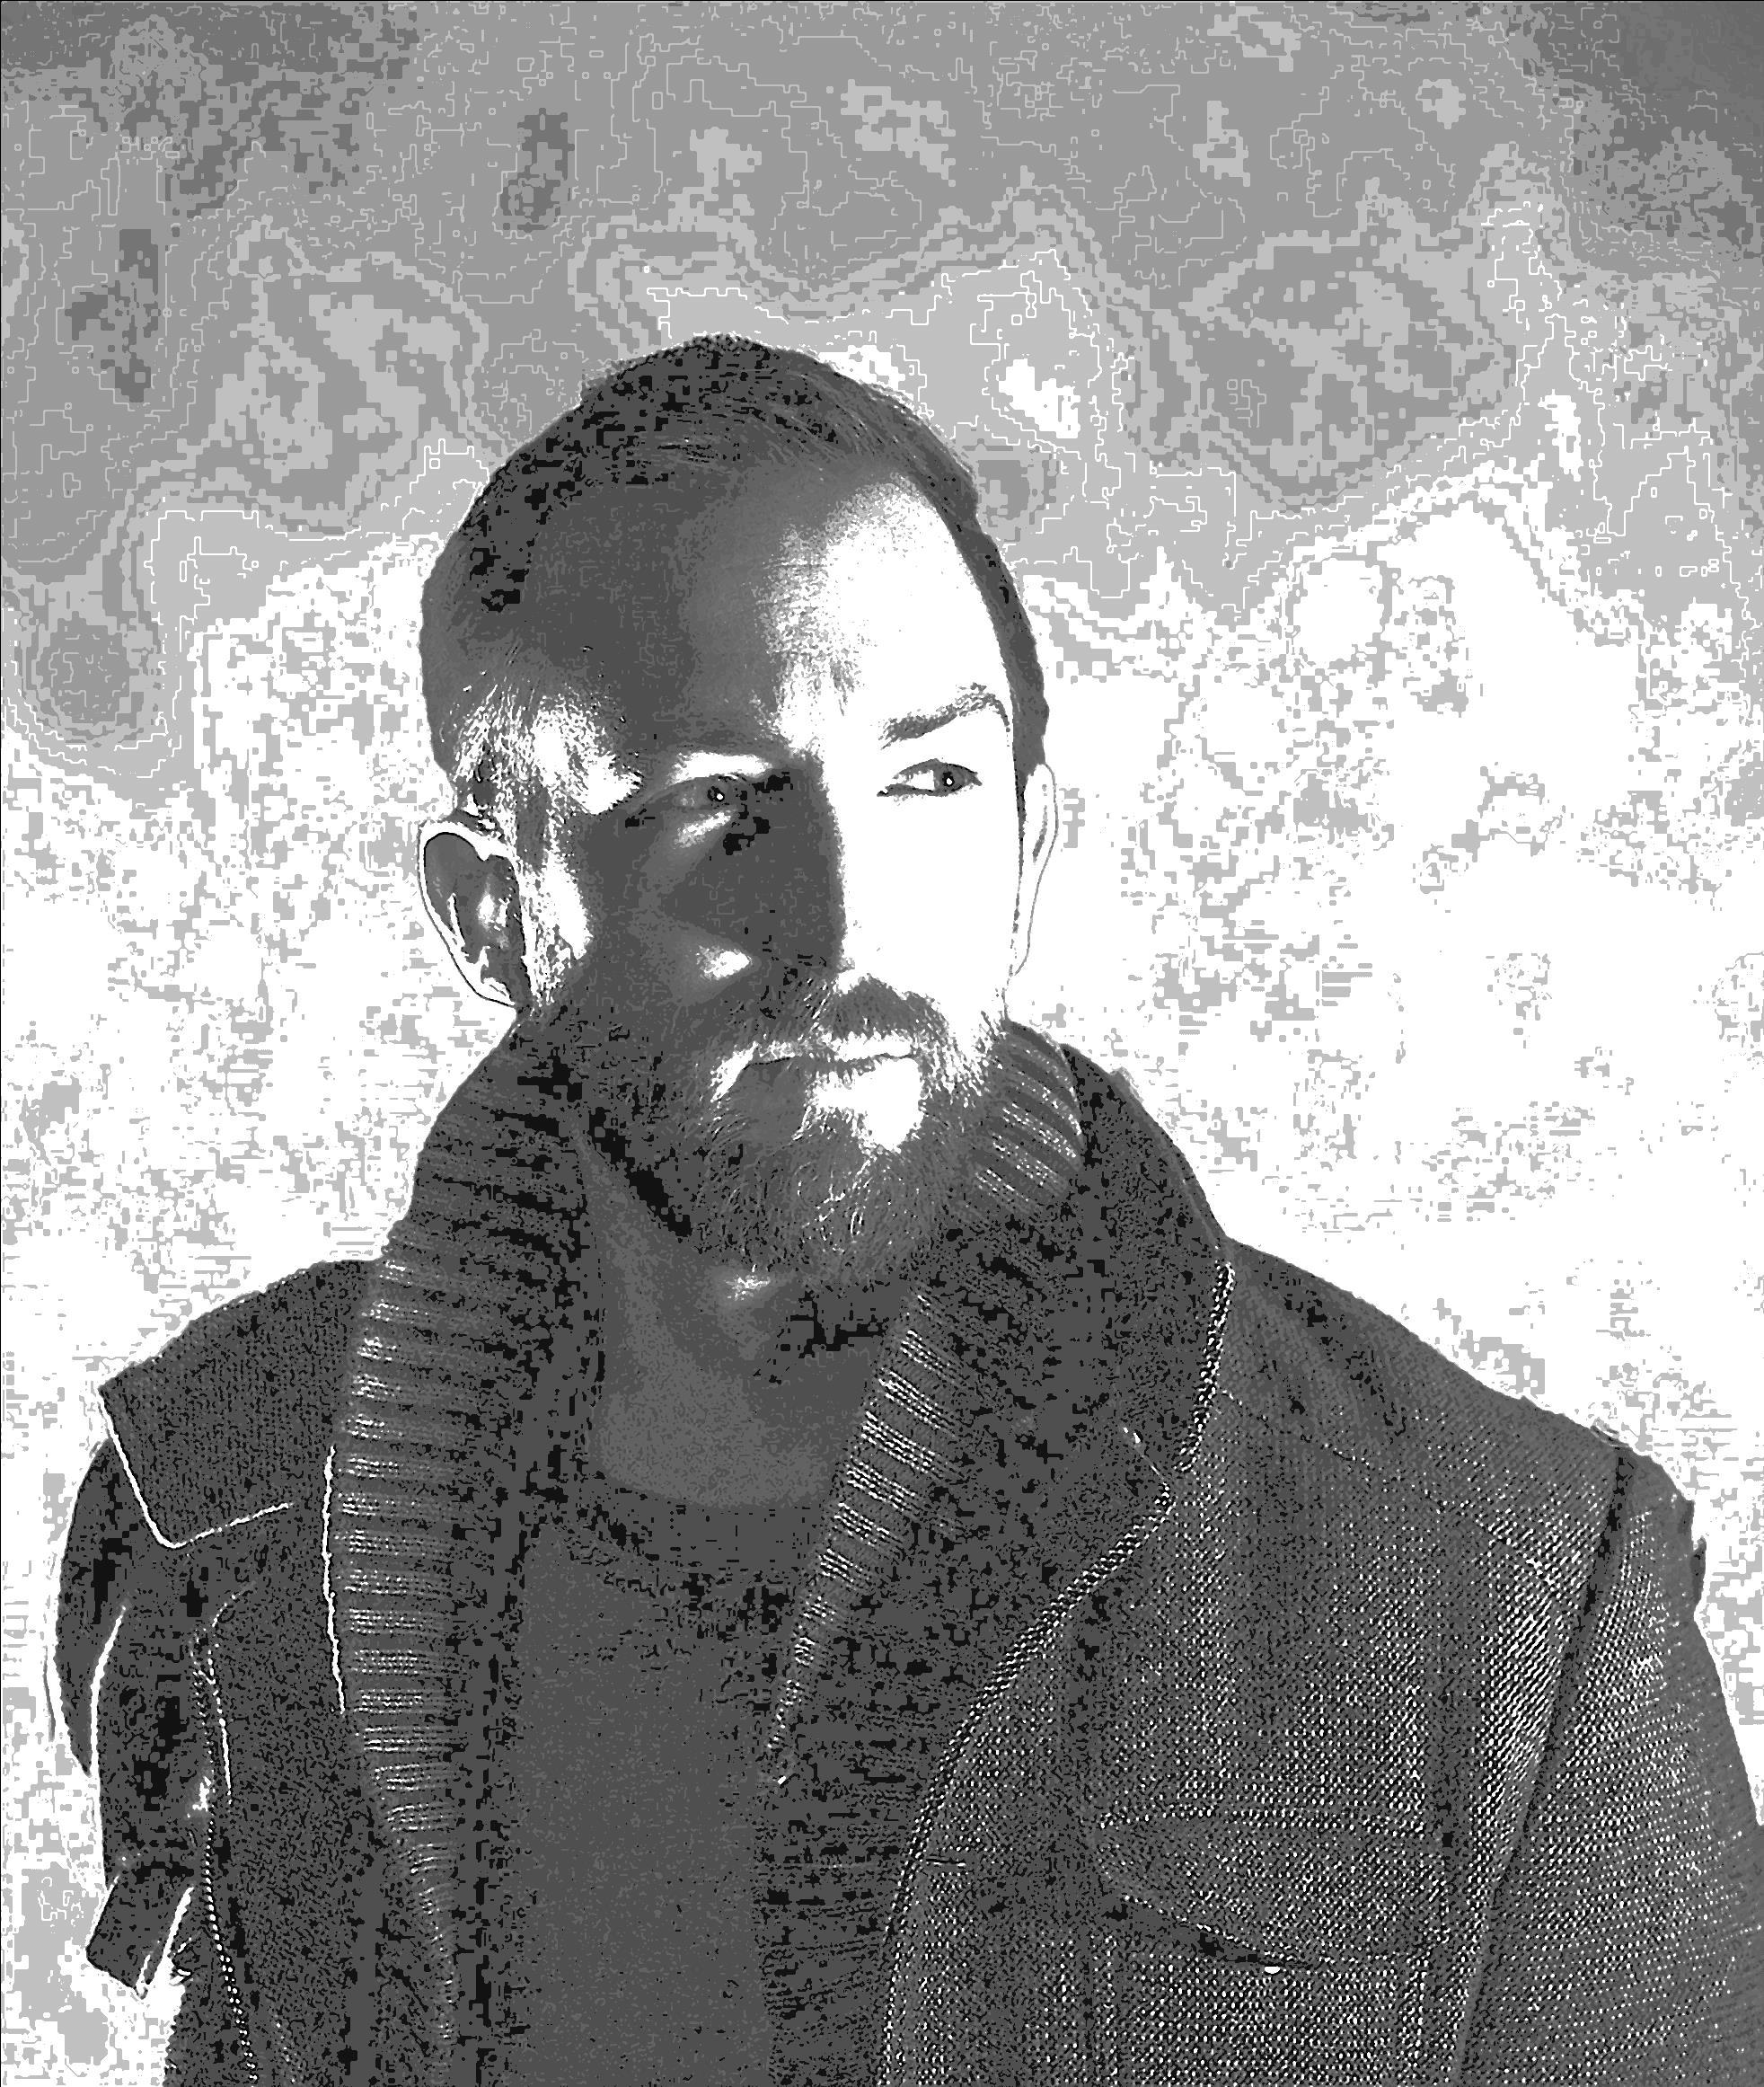 Lucas Gilbertson